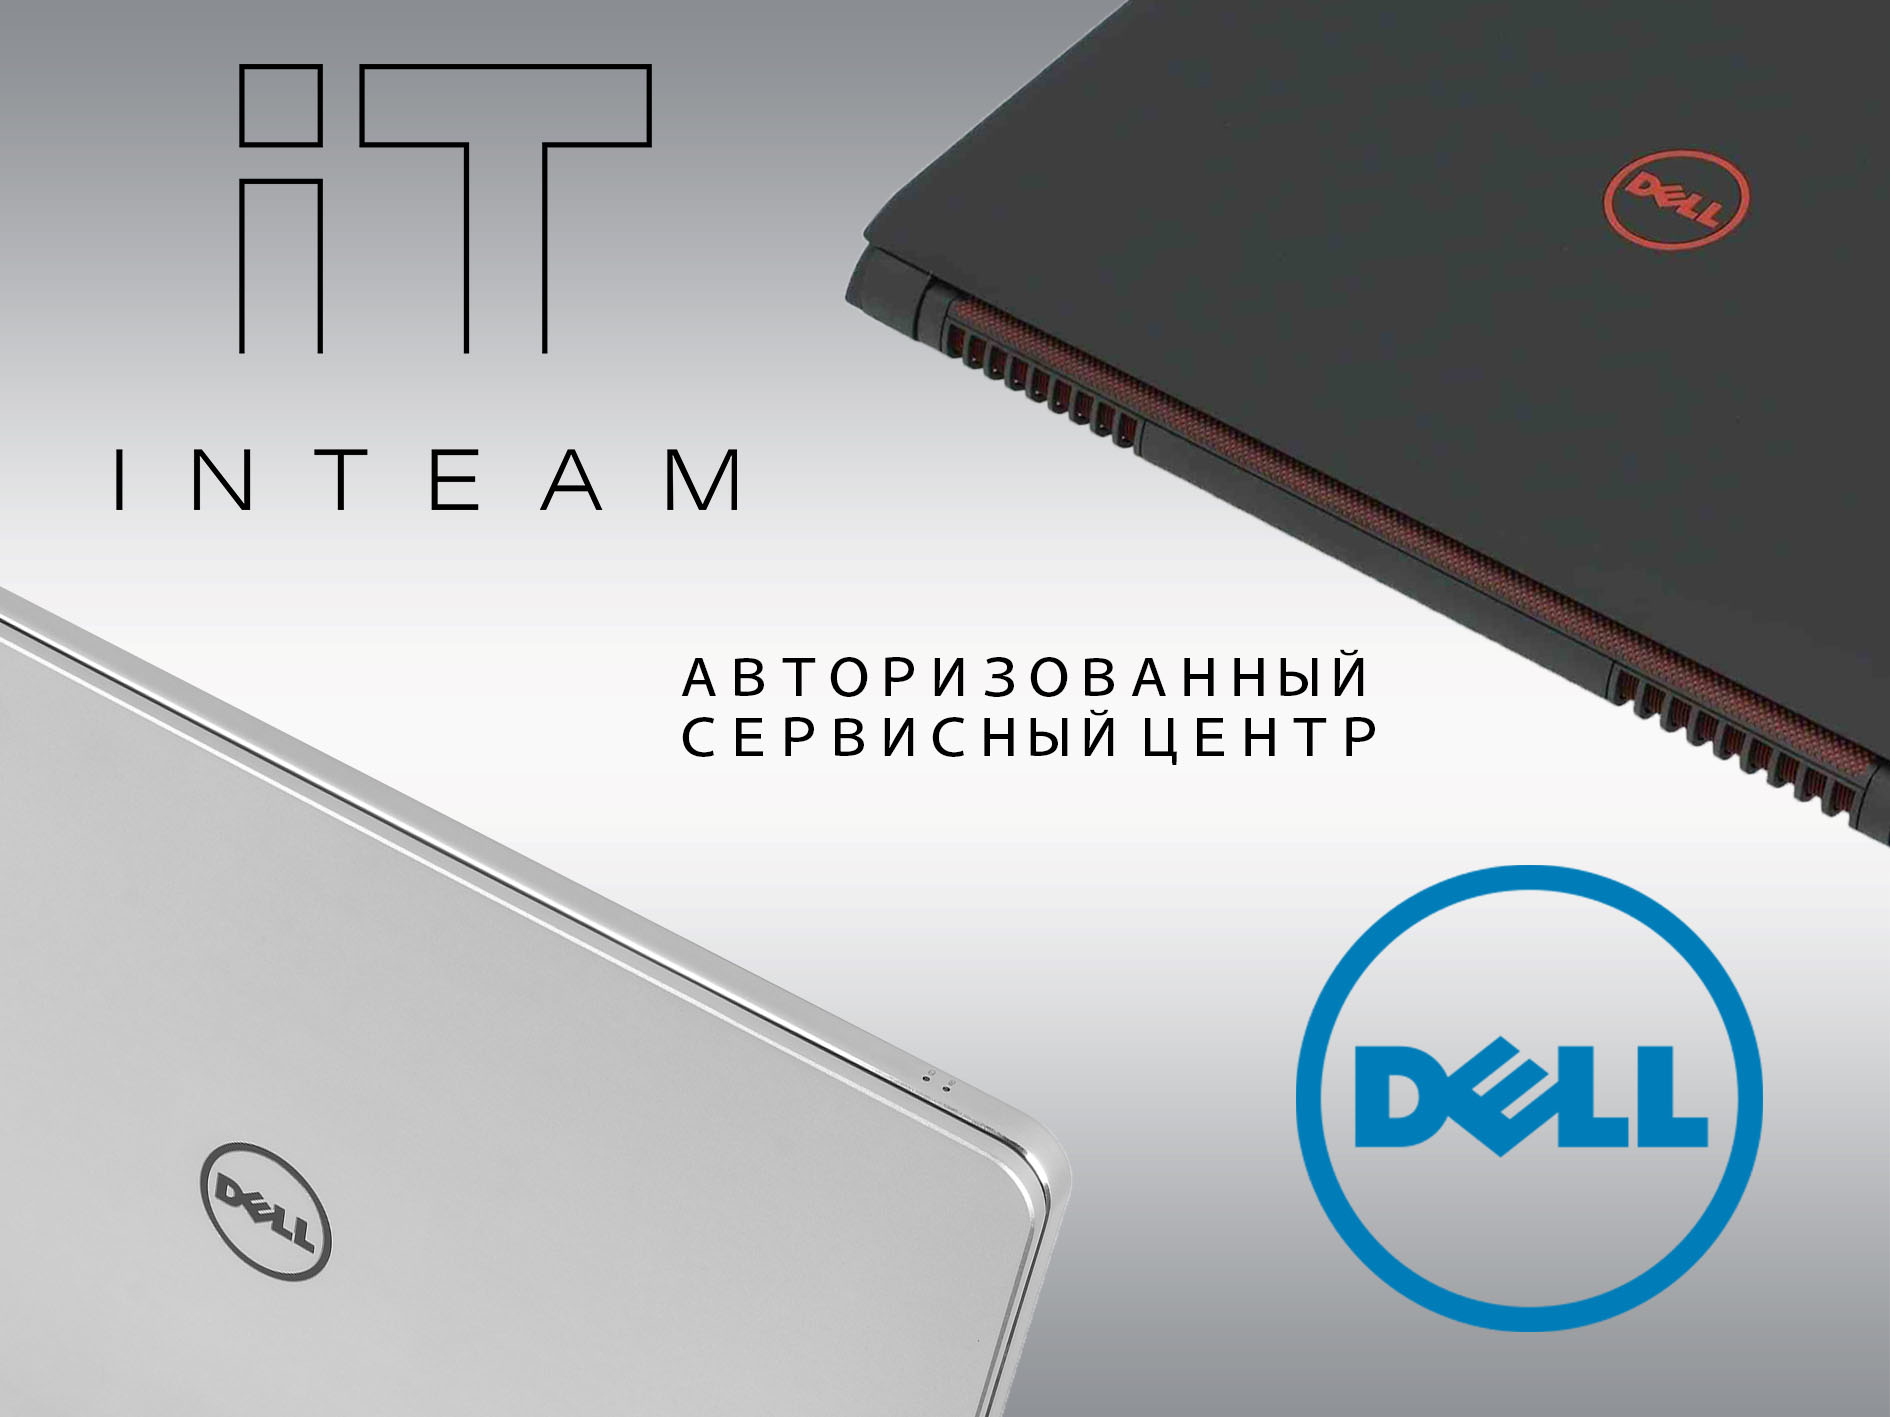 сервисный центр Dell Одесса